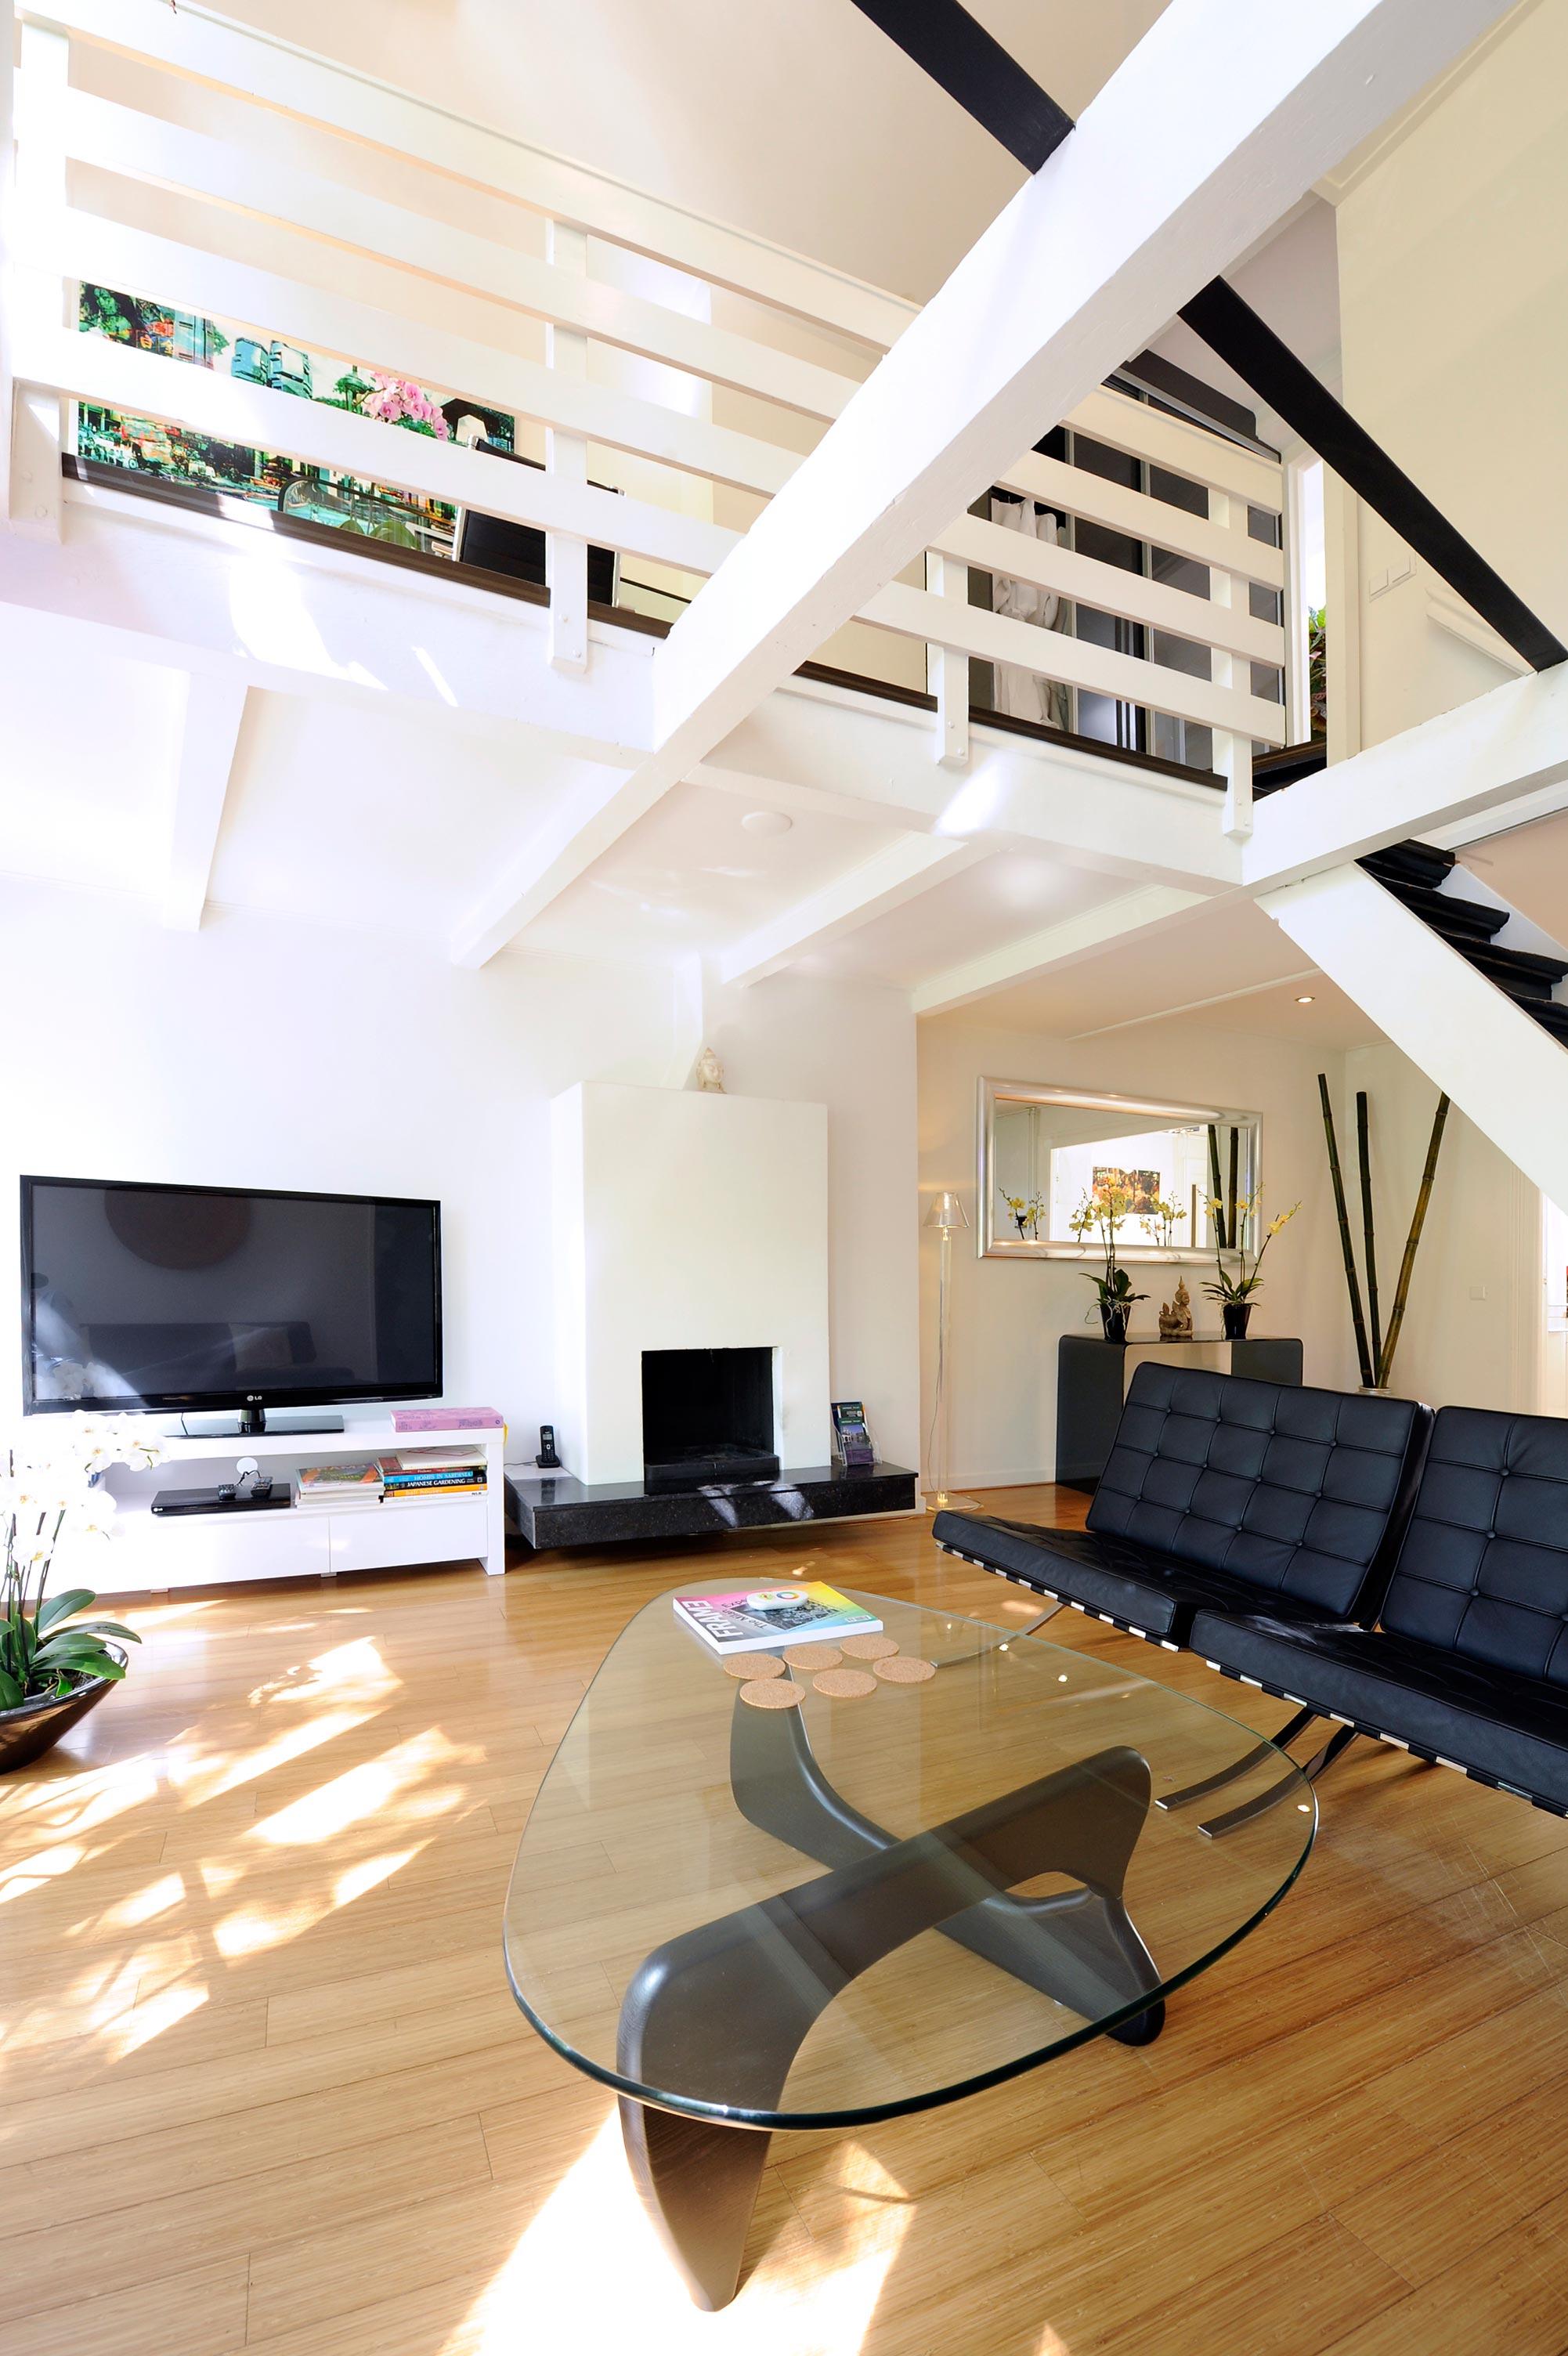 Luxury Amsterdam 2 bedroom short stay design apartment